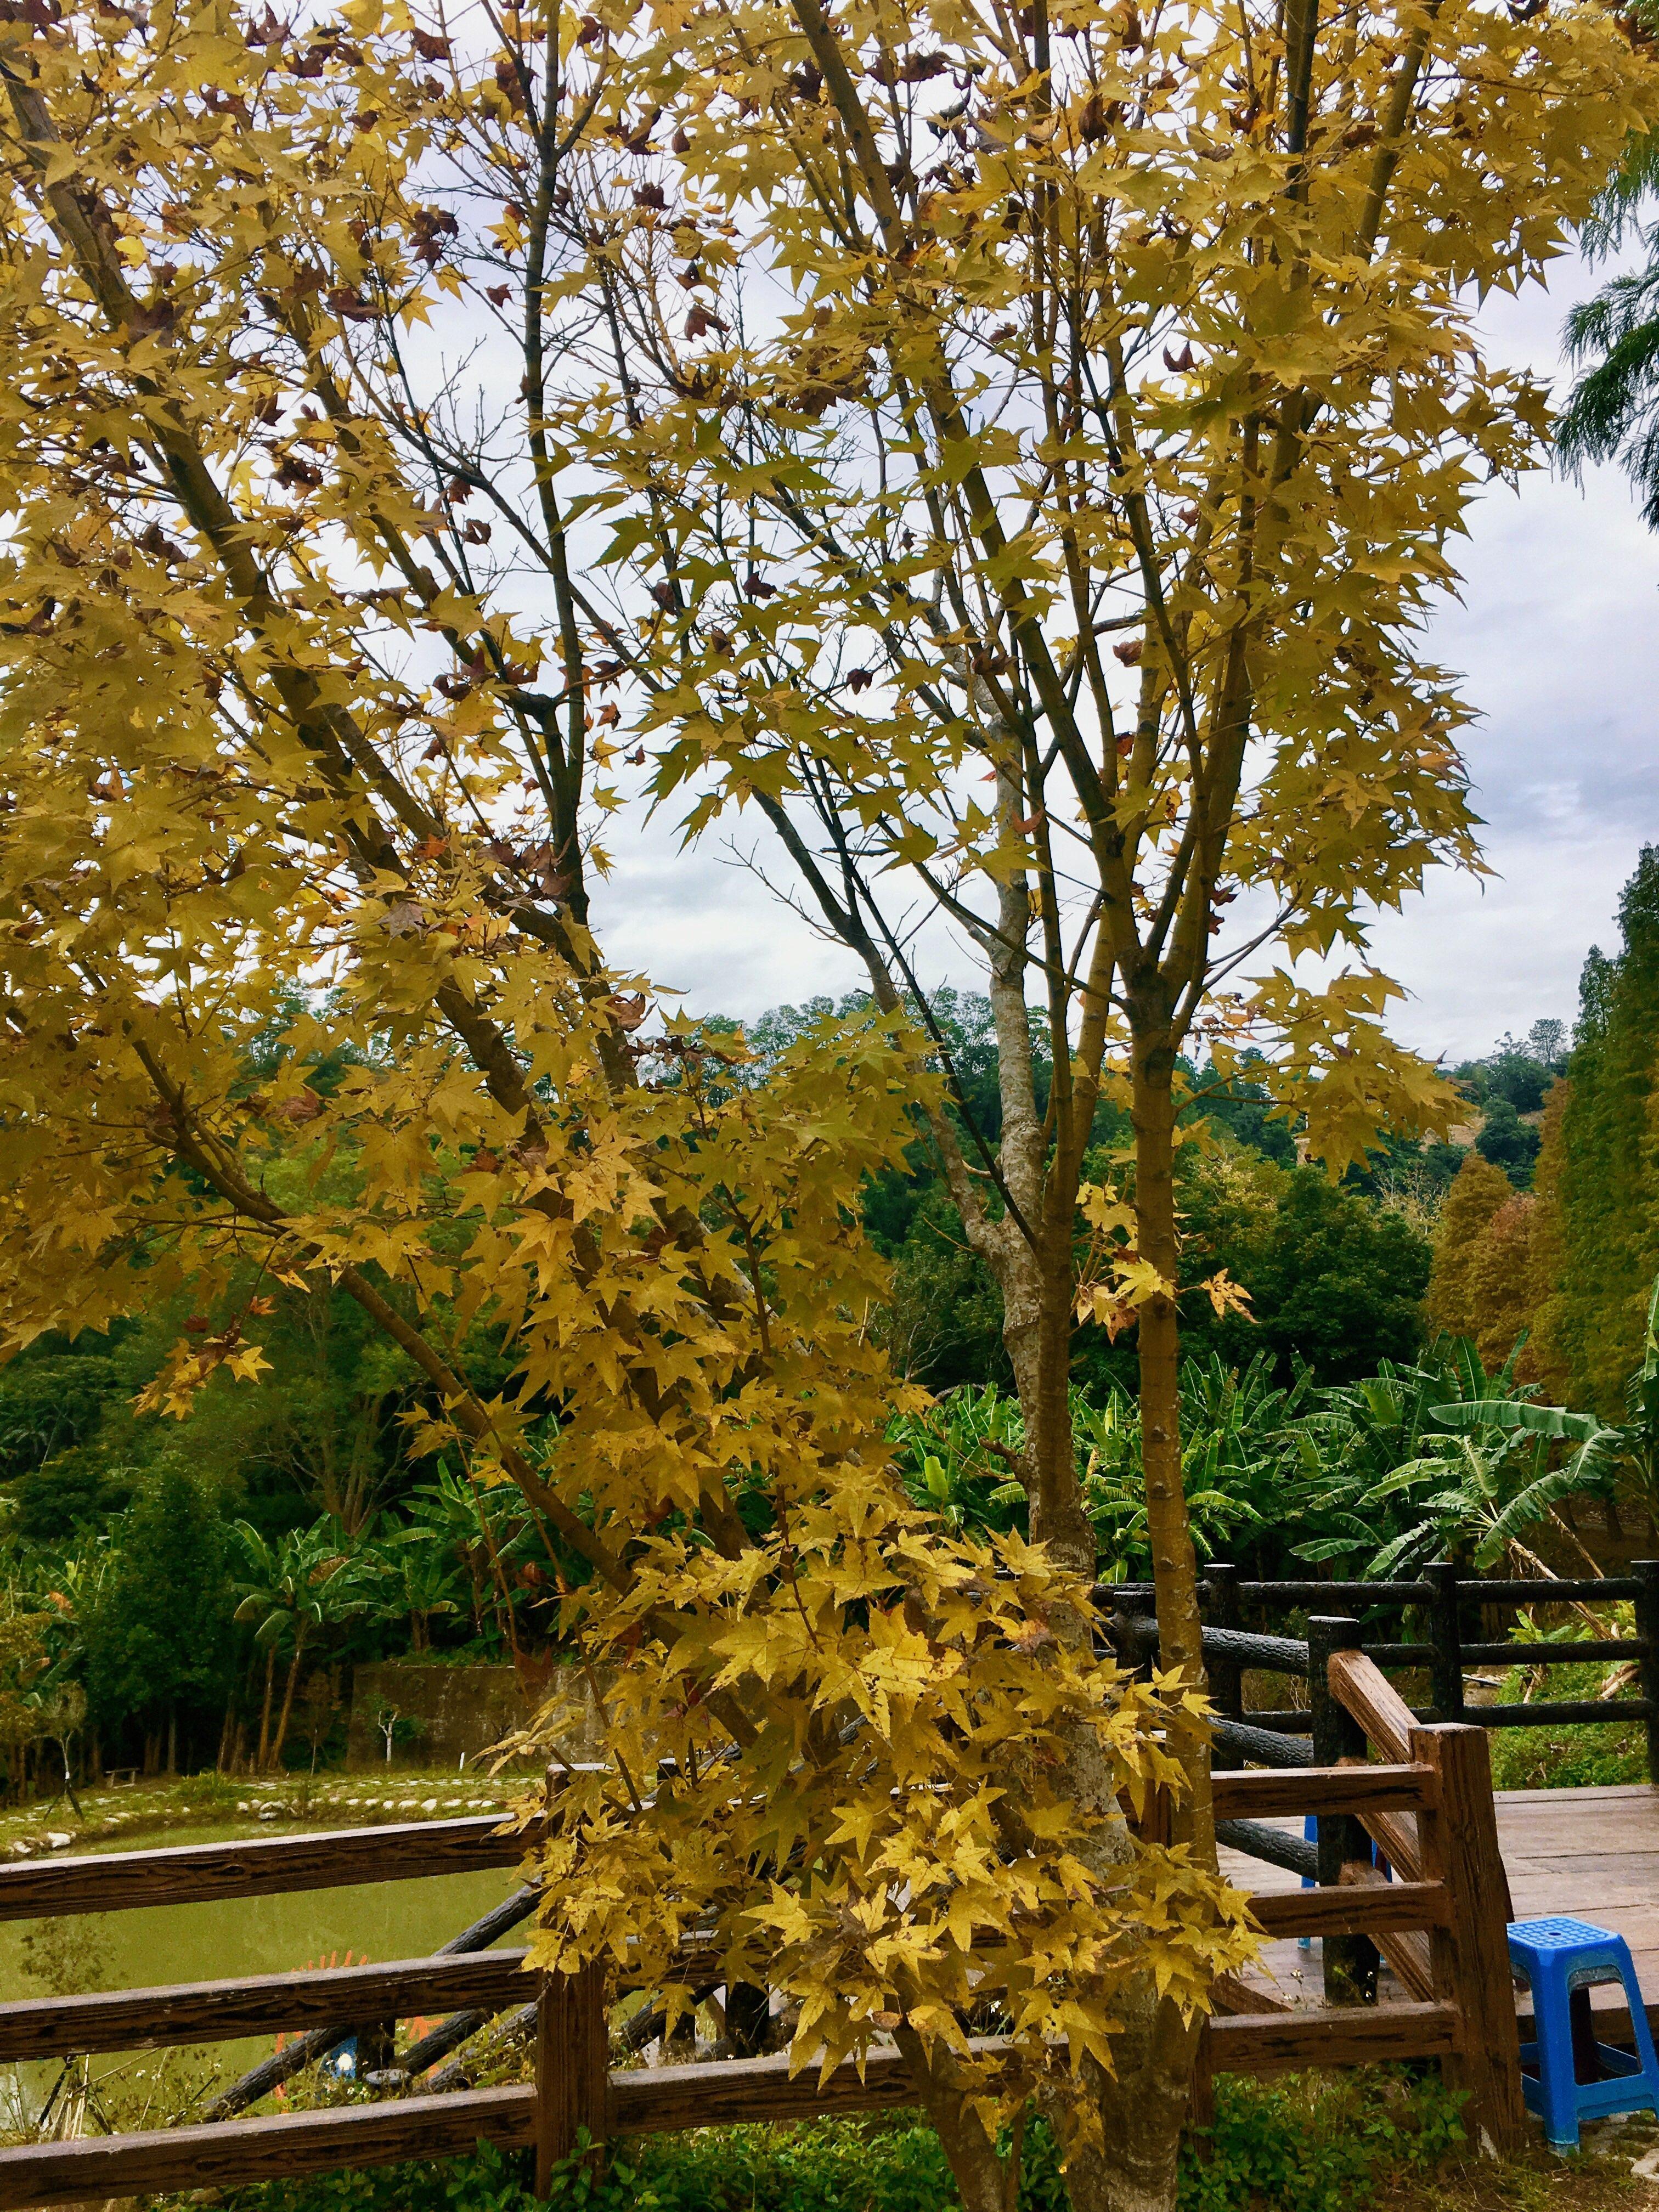 beipu liutang bald cypress trees hsinchu Taiwan mapple tree